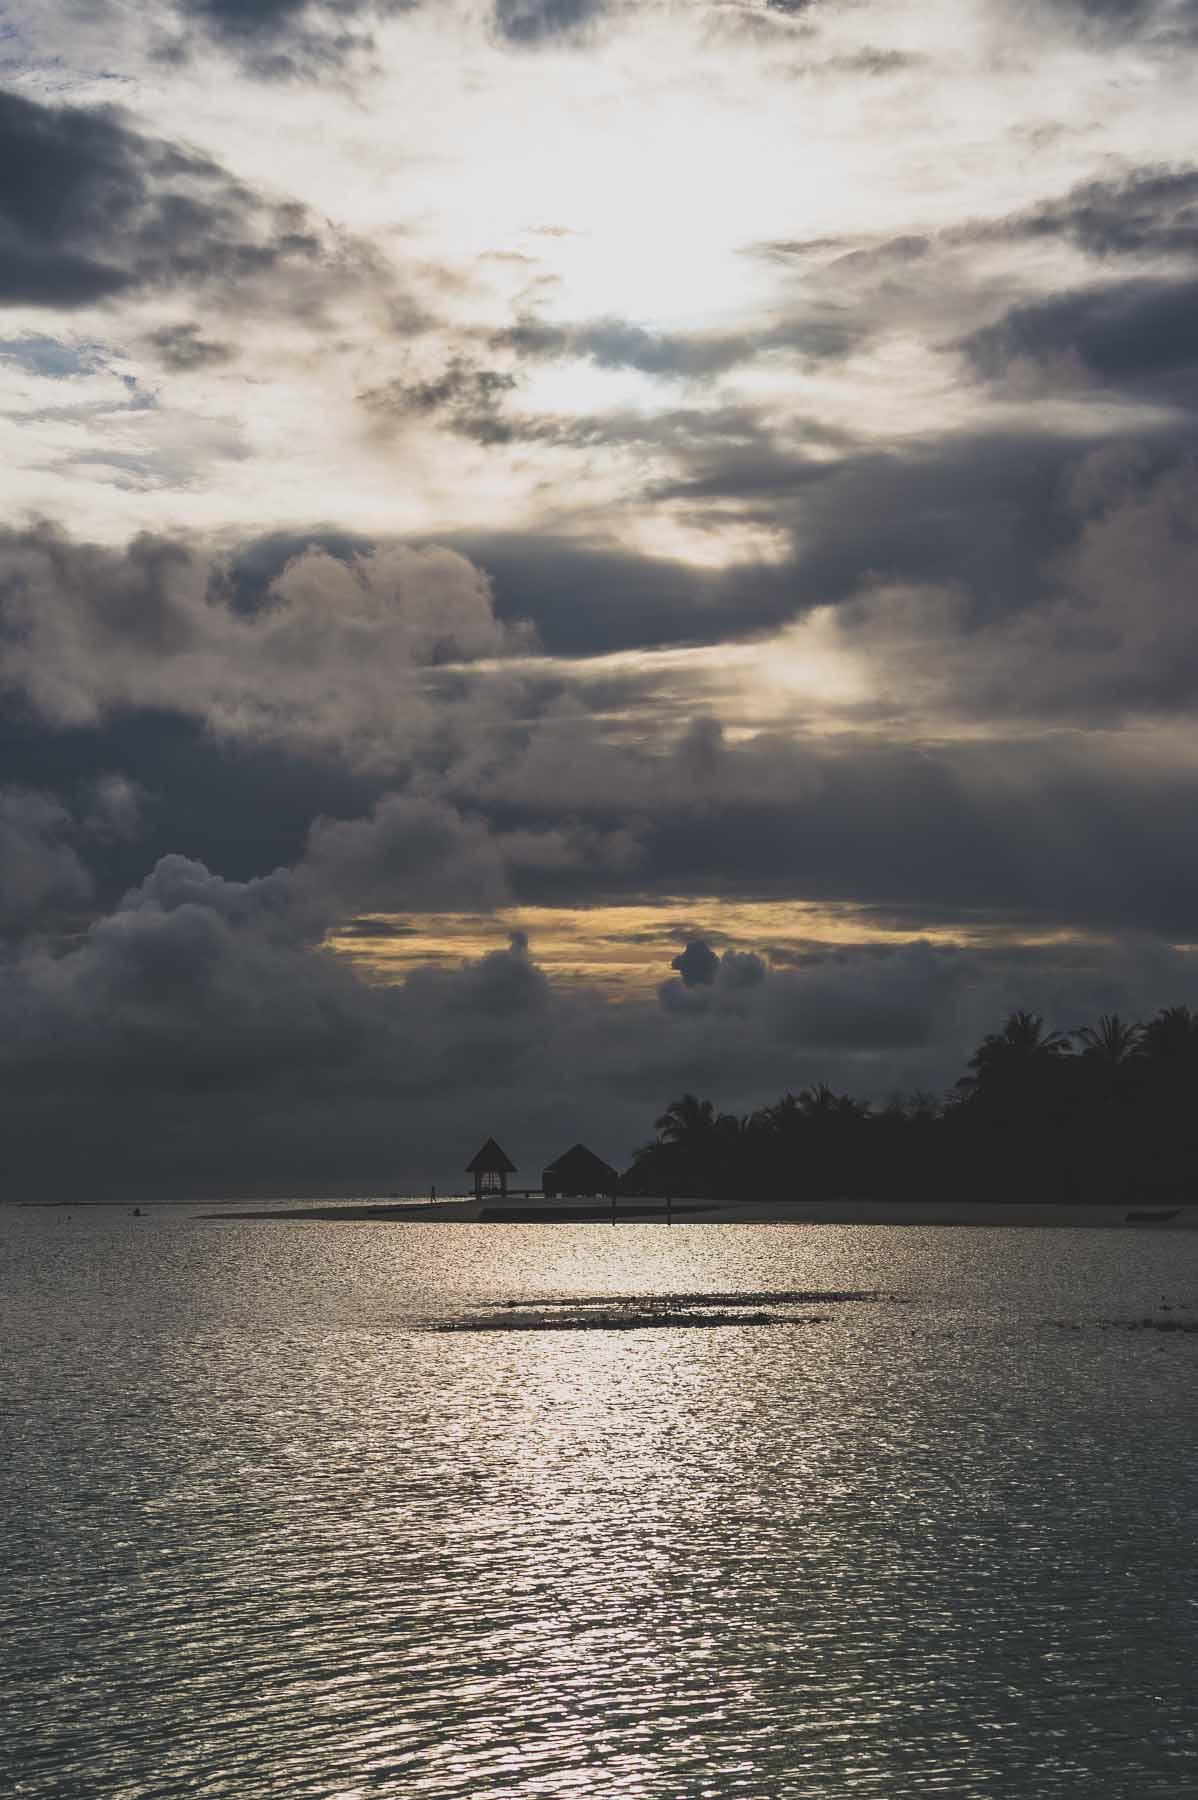 Anantara Dhigu Sunset